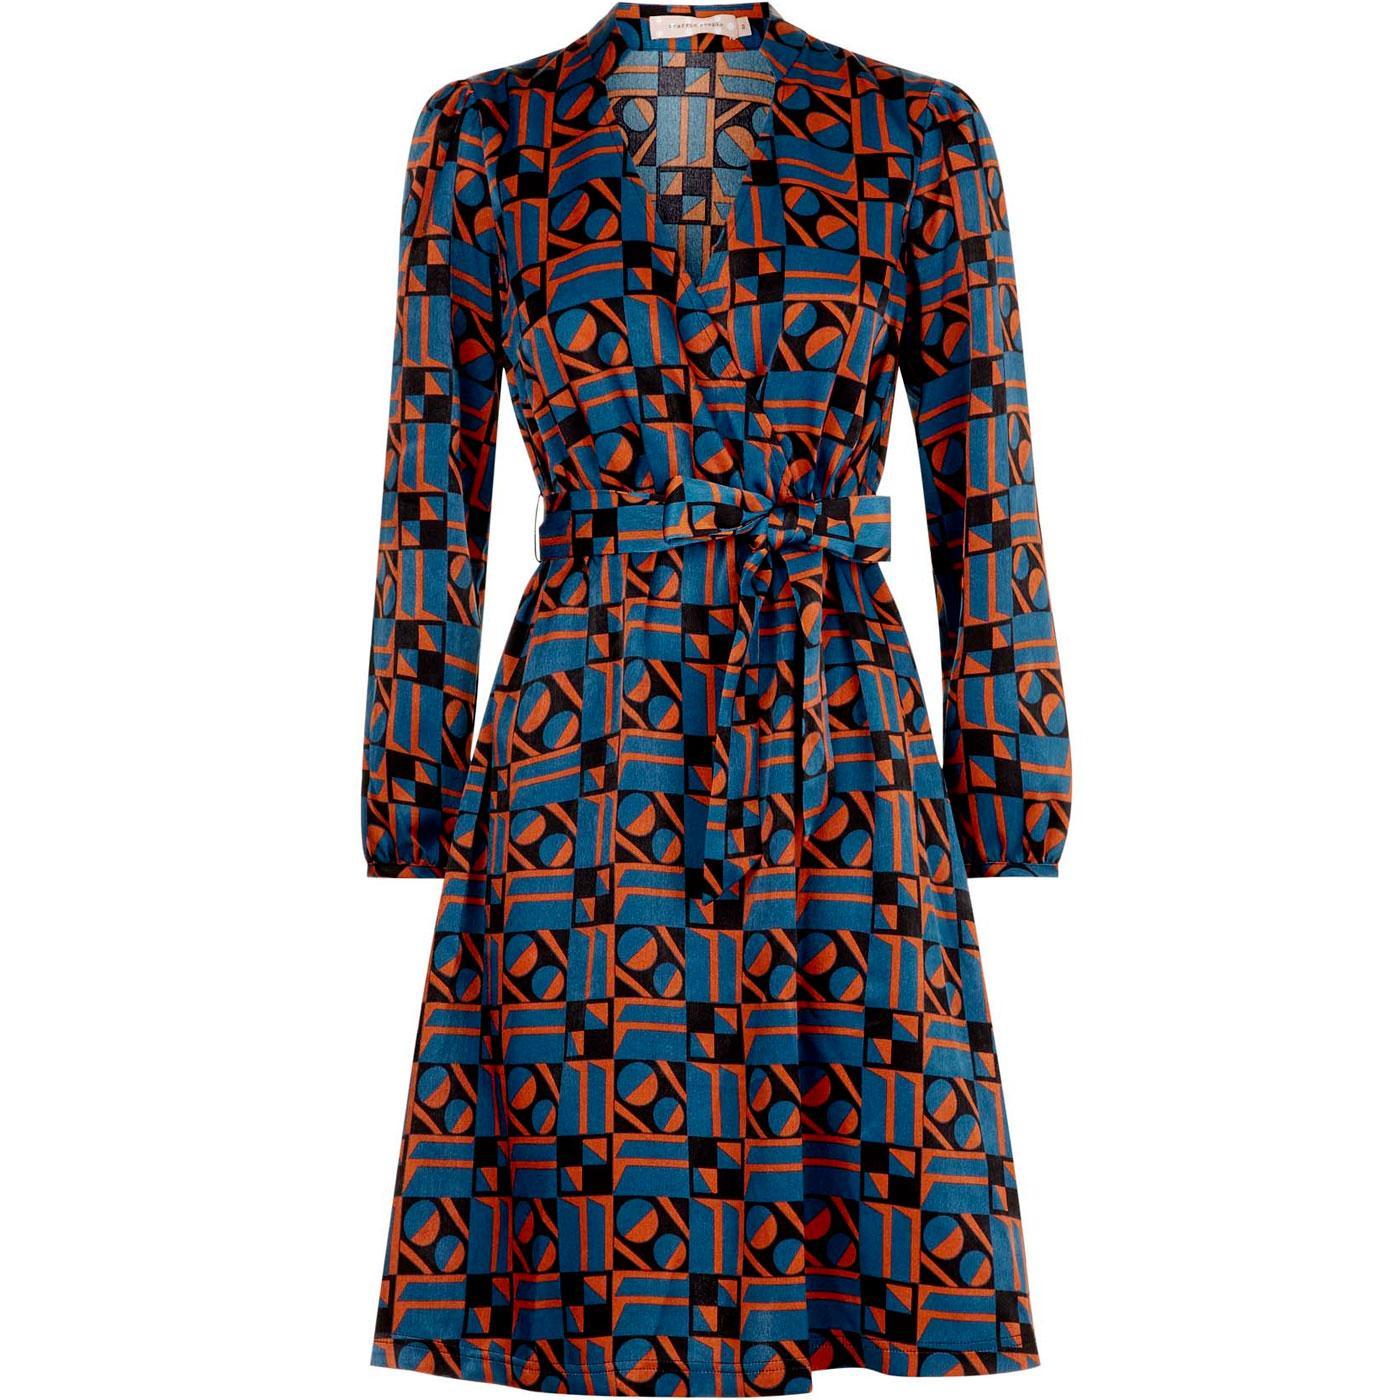 Definitely TRAFFIC PEOPLE Geometric Pinball Dress